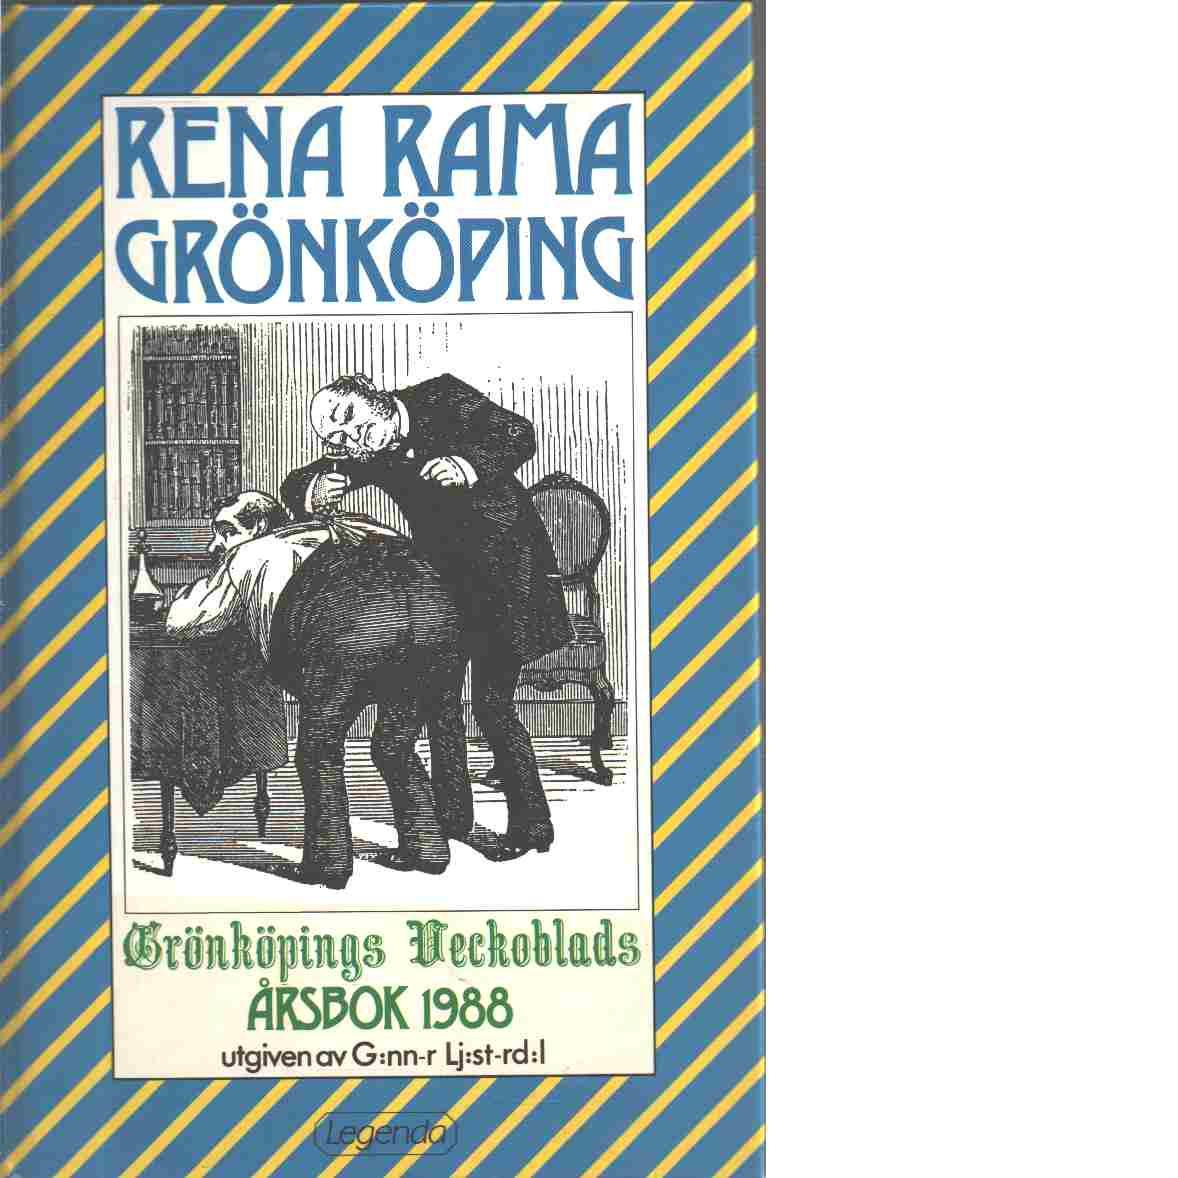 Rena rama Grönköping - Ljusterdal, Gunnar